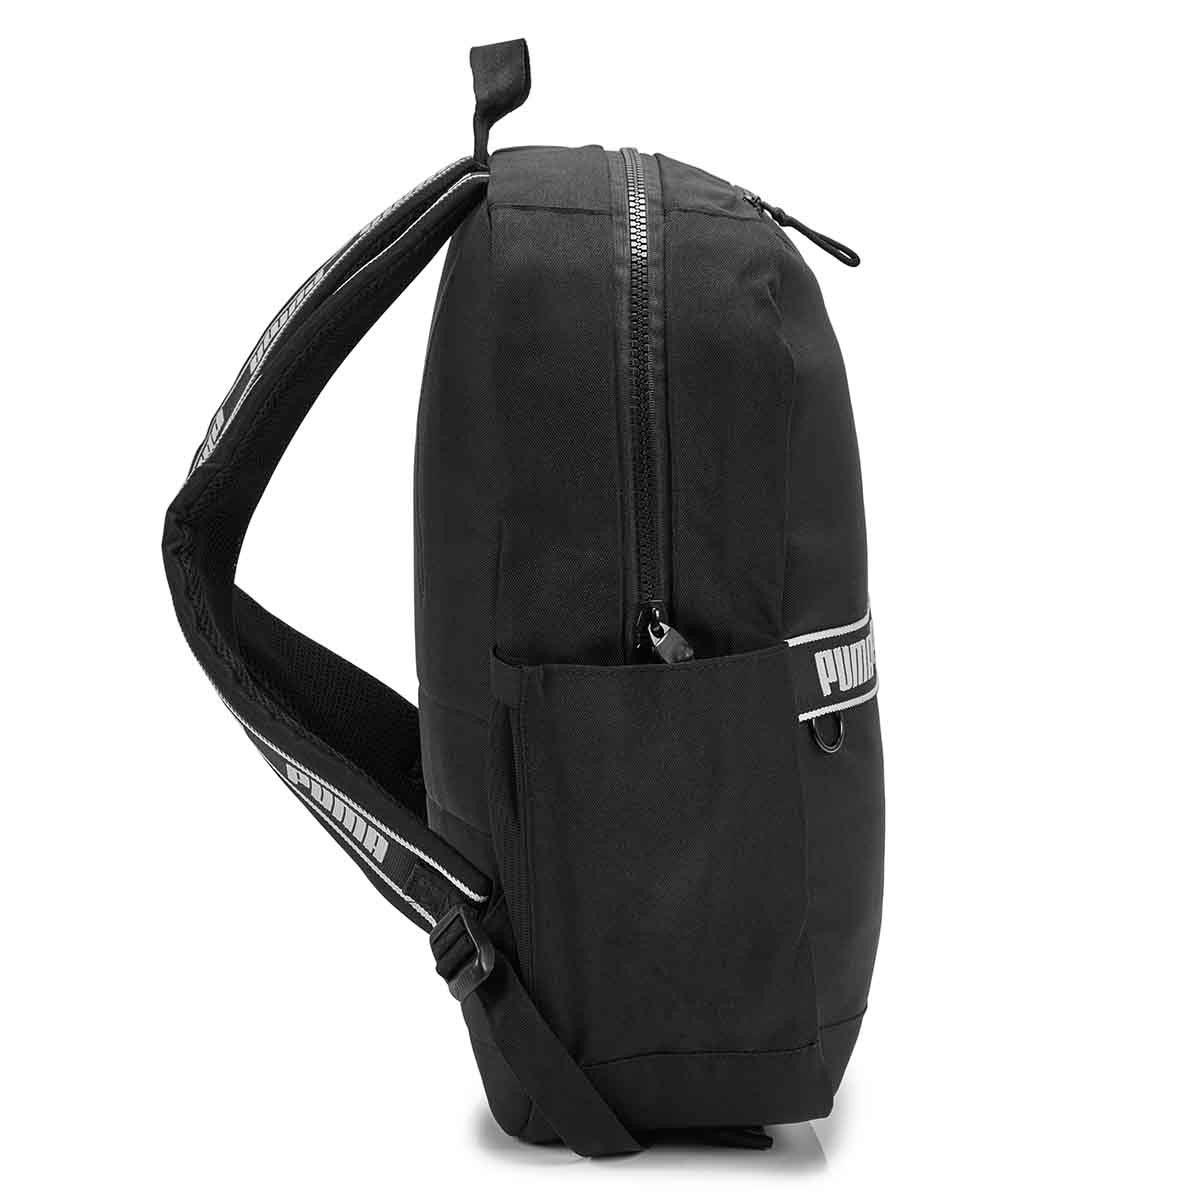 Unisex Linear black backpack